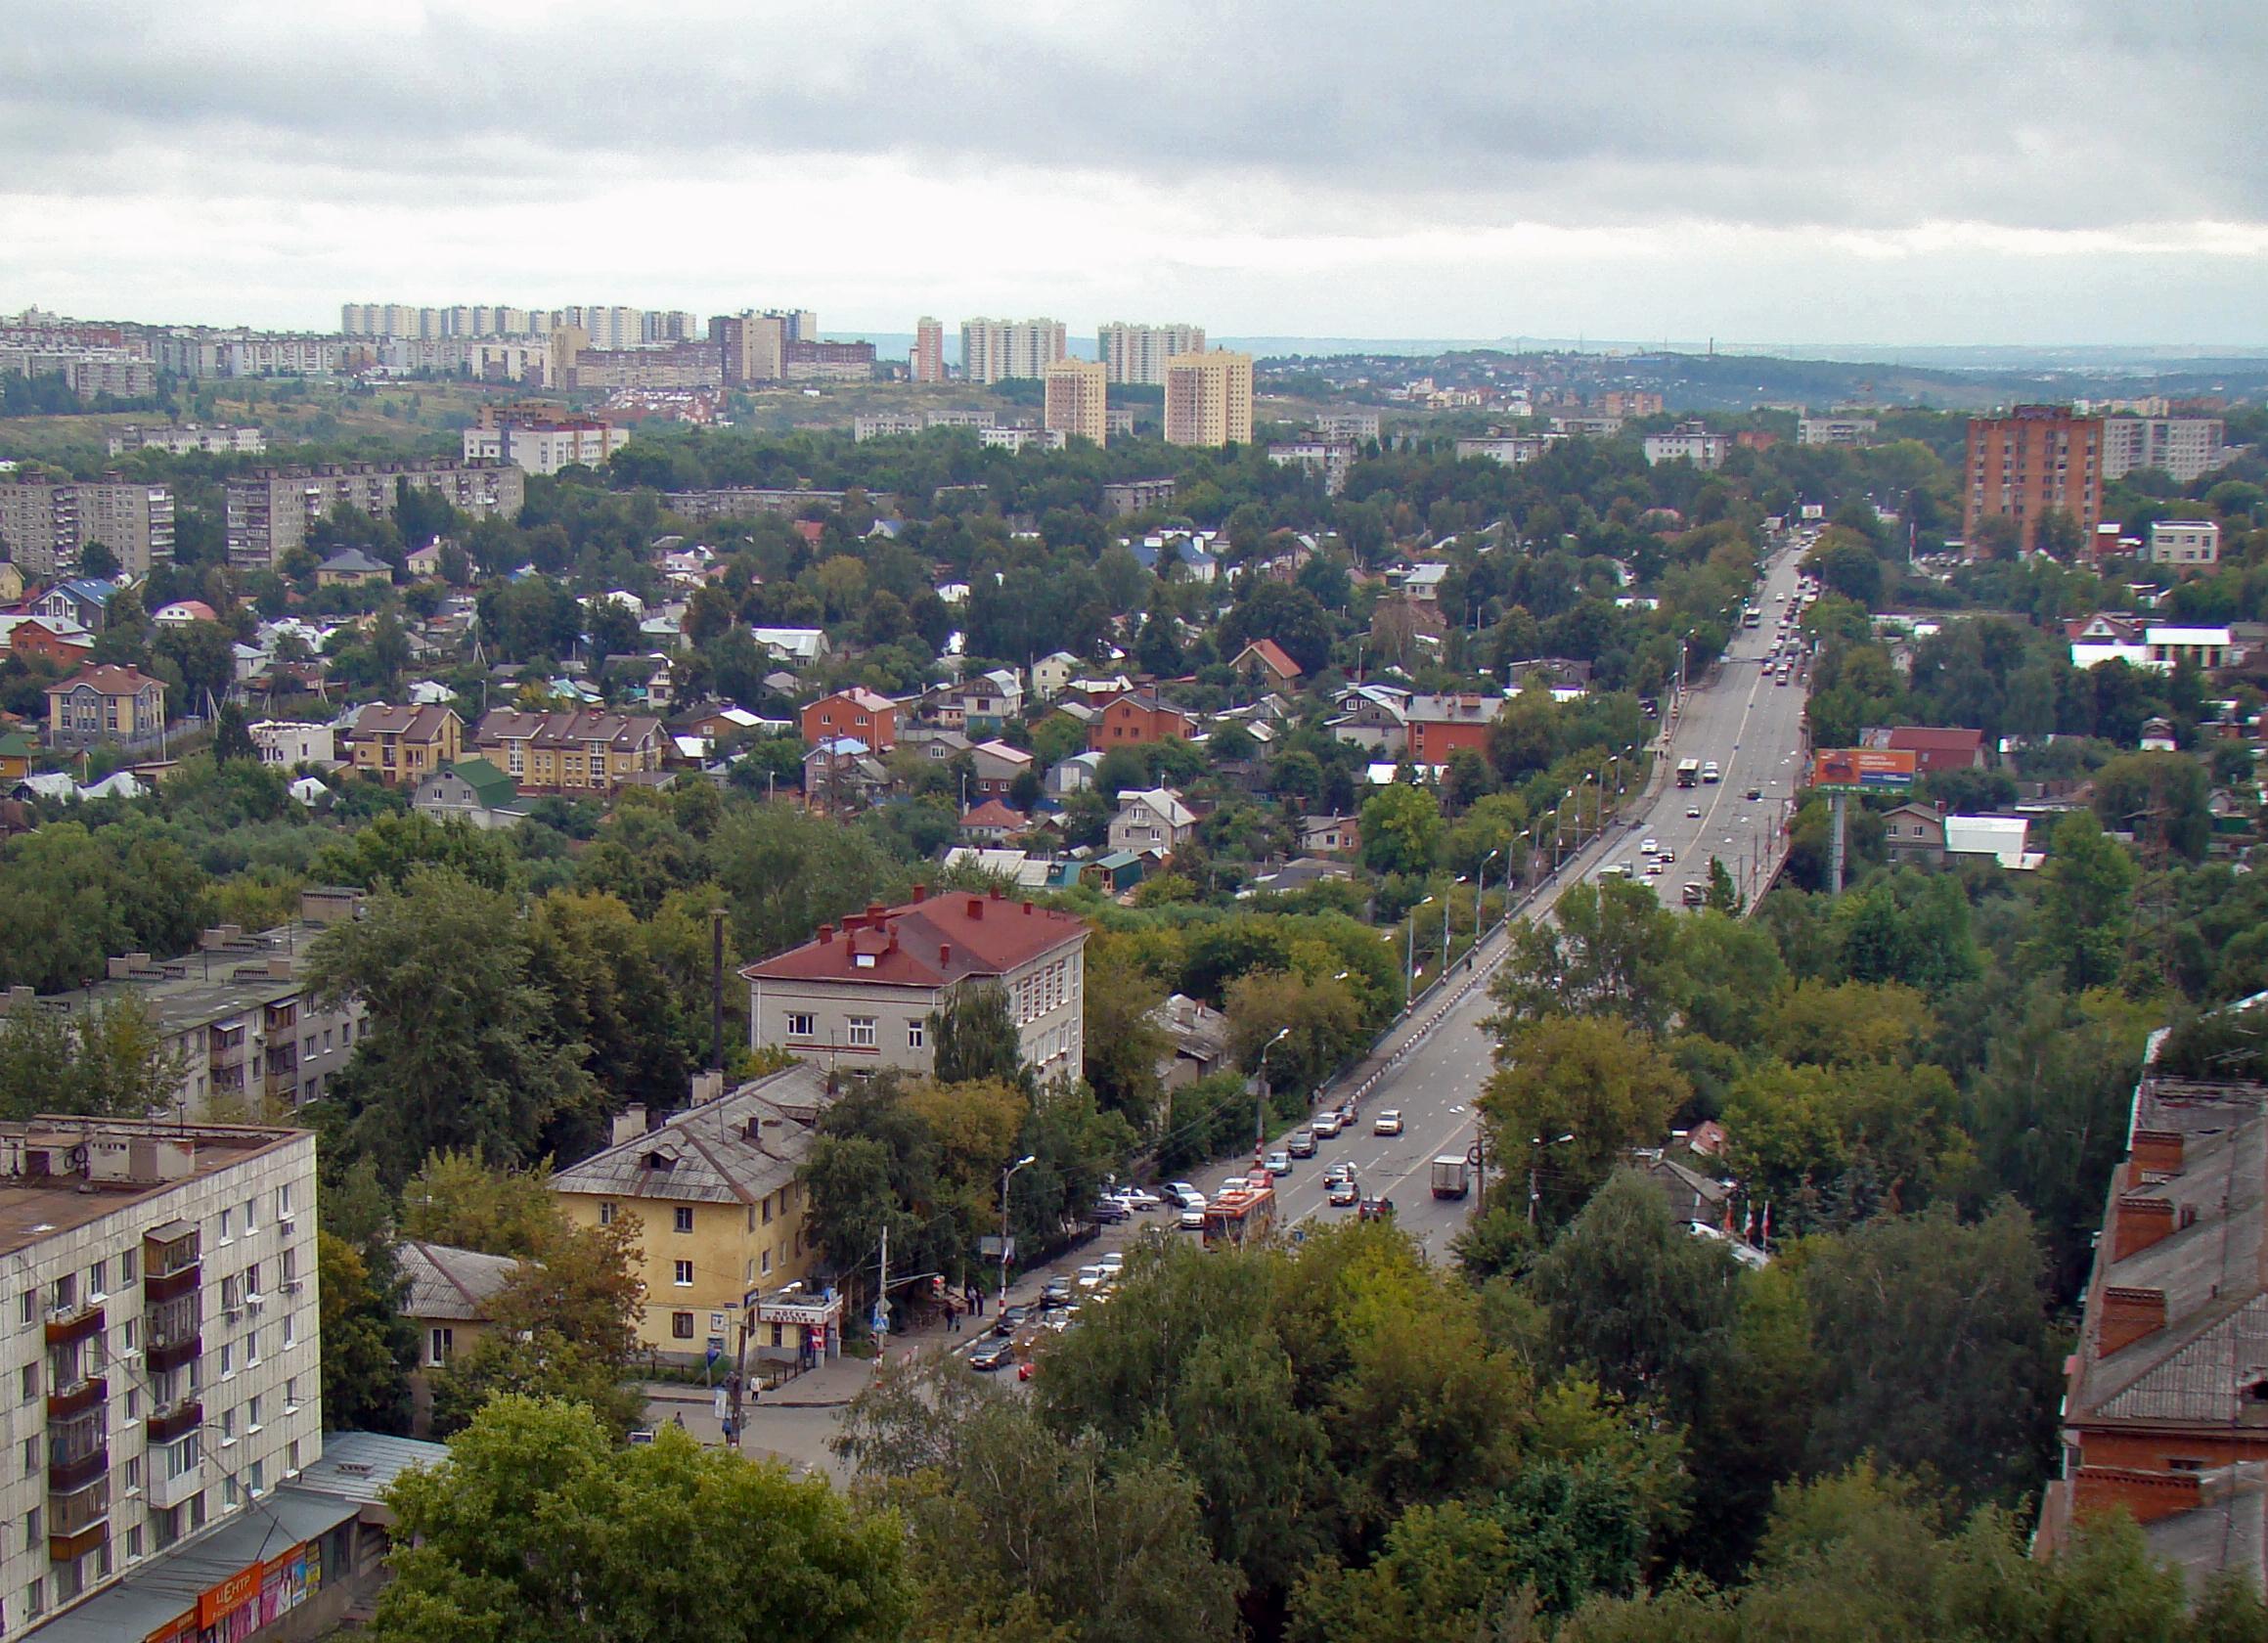 Archivo:nizhny novgorod vaneev street. - wikipedia, la enciclopedia